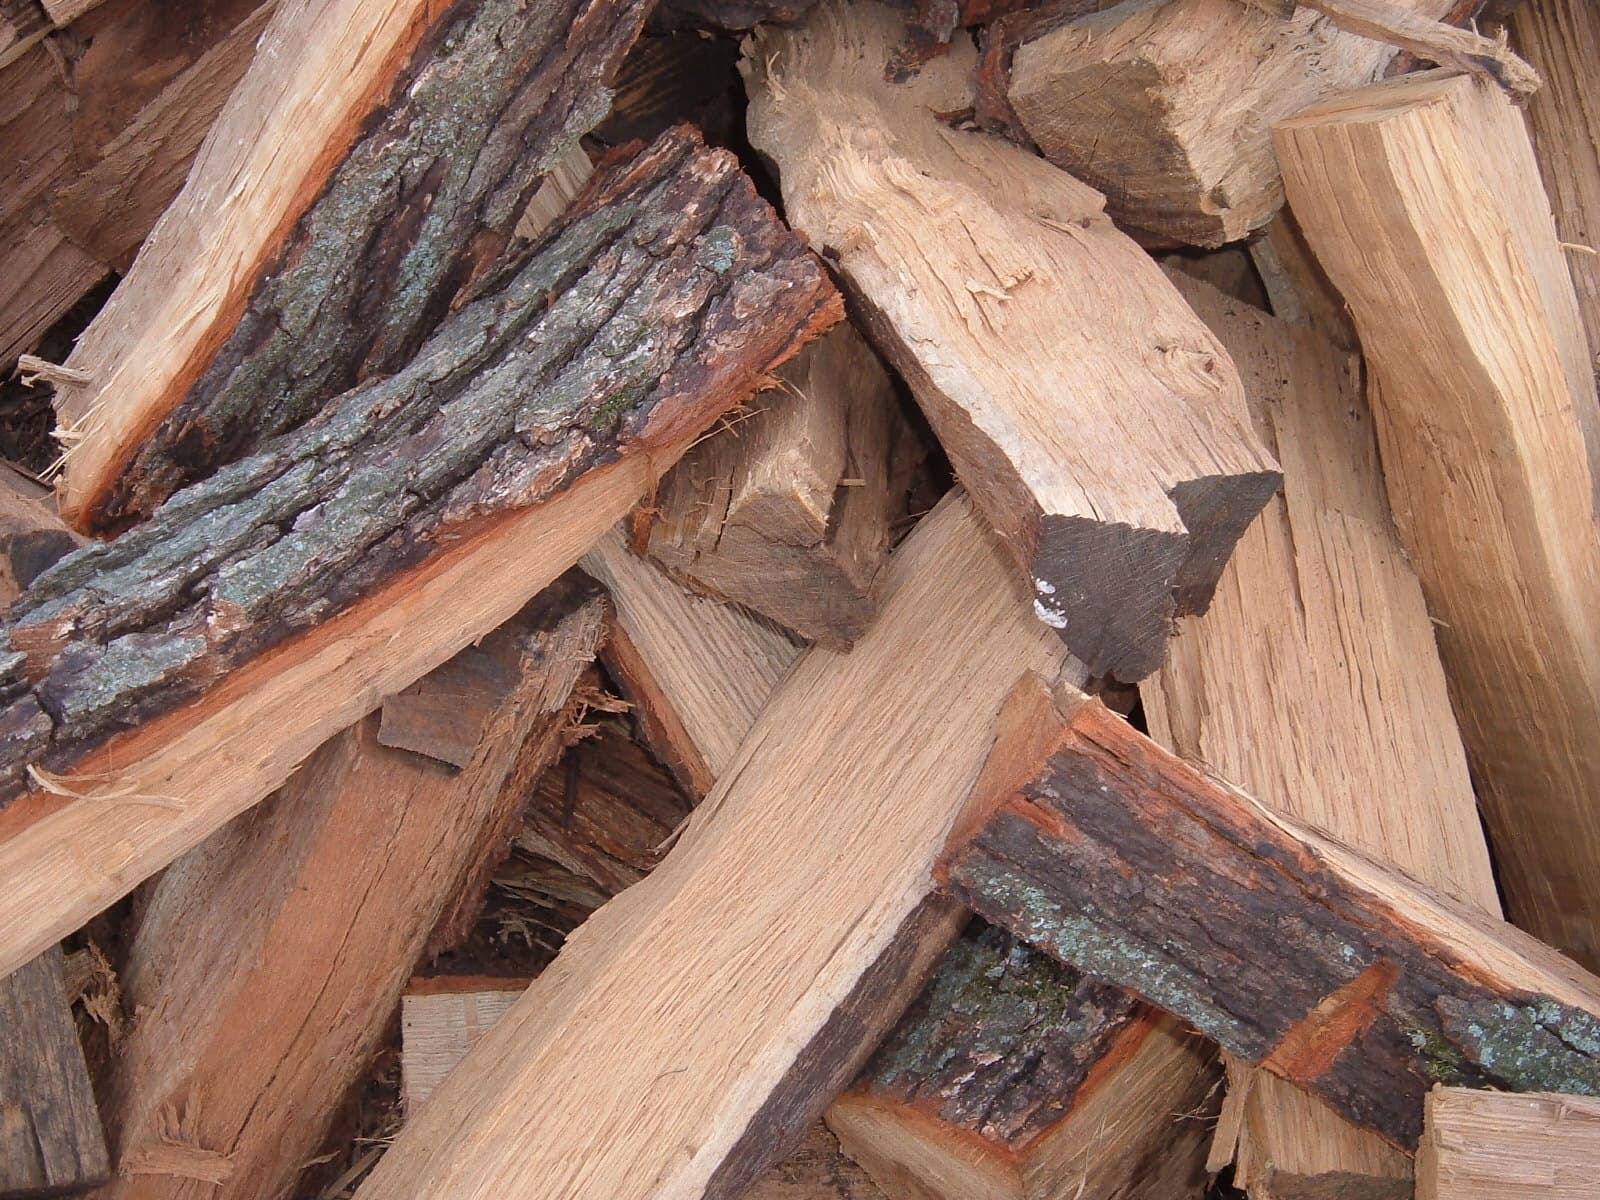 Oak Wood Firewood | tradekorea